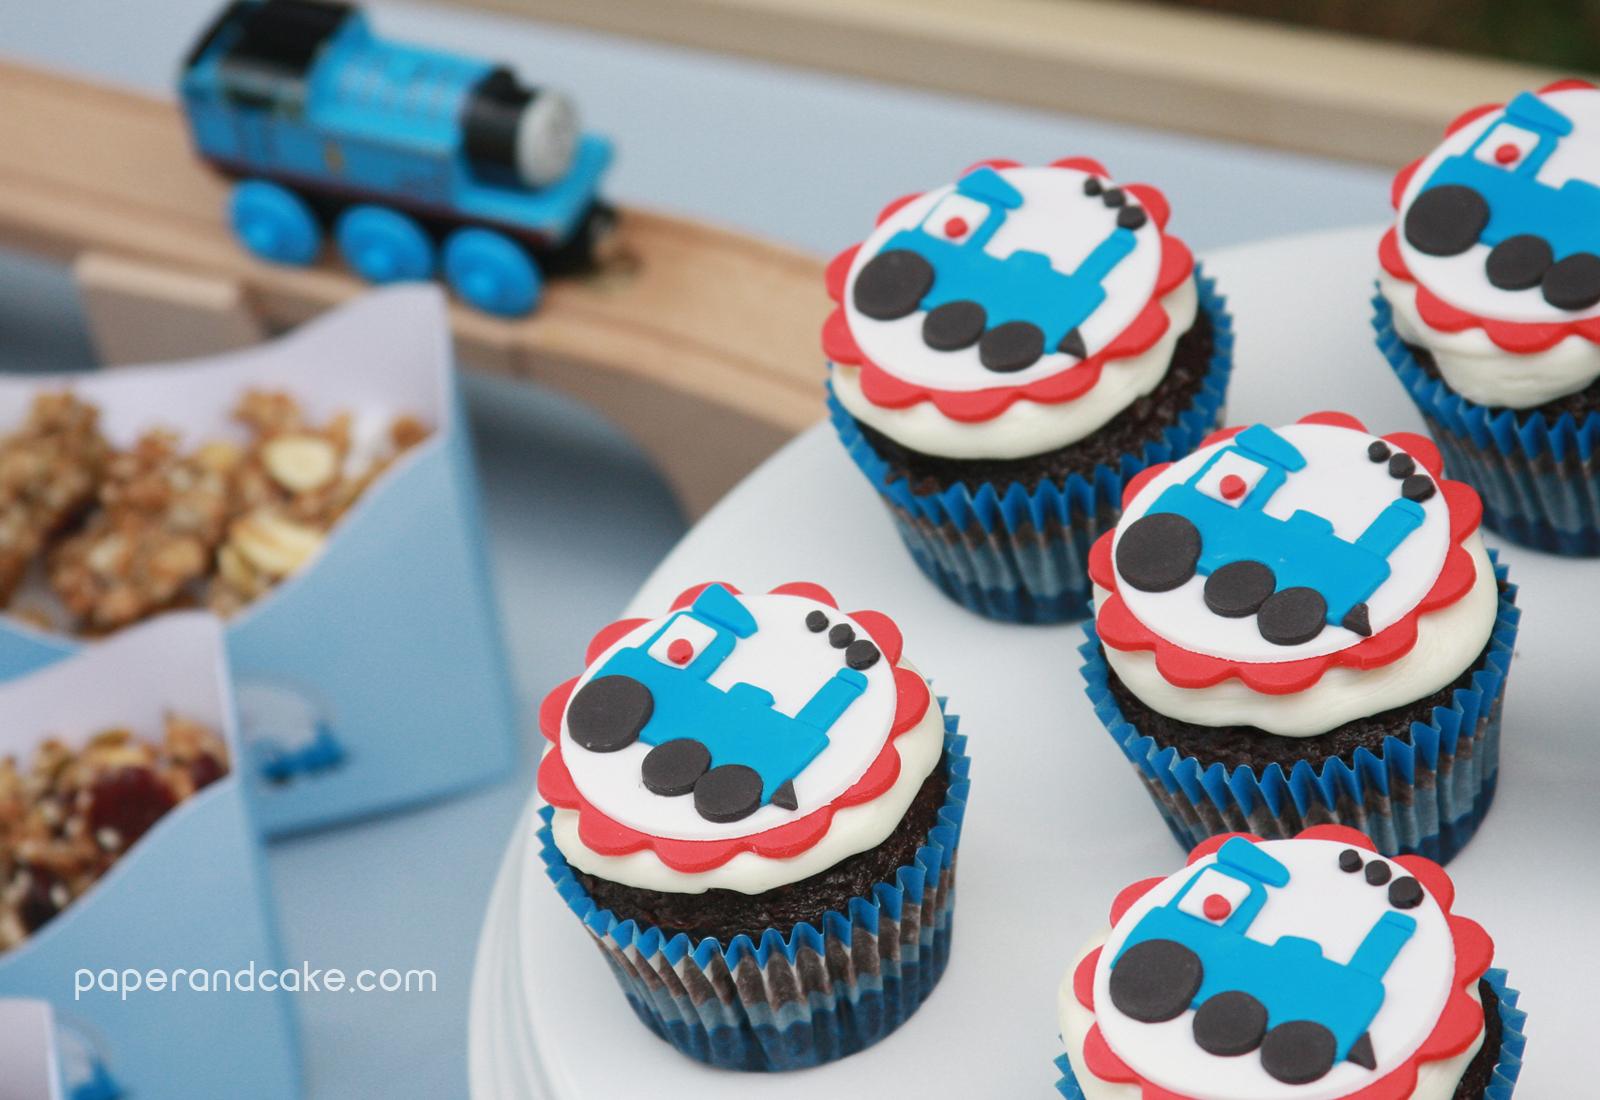 Paper and Cake u00bb Products u00bb Birthday u00bb Train Printable Birthday ...